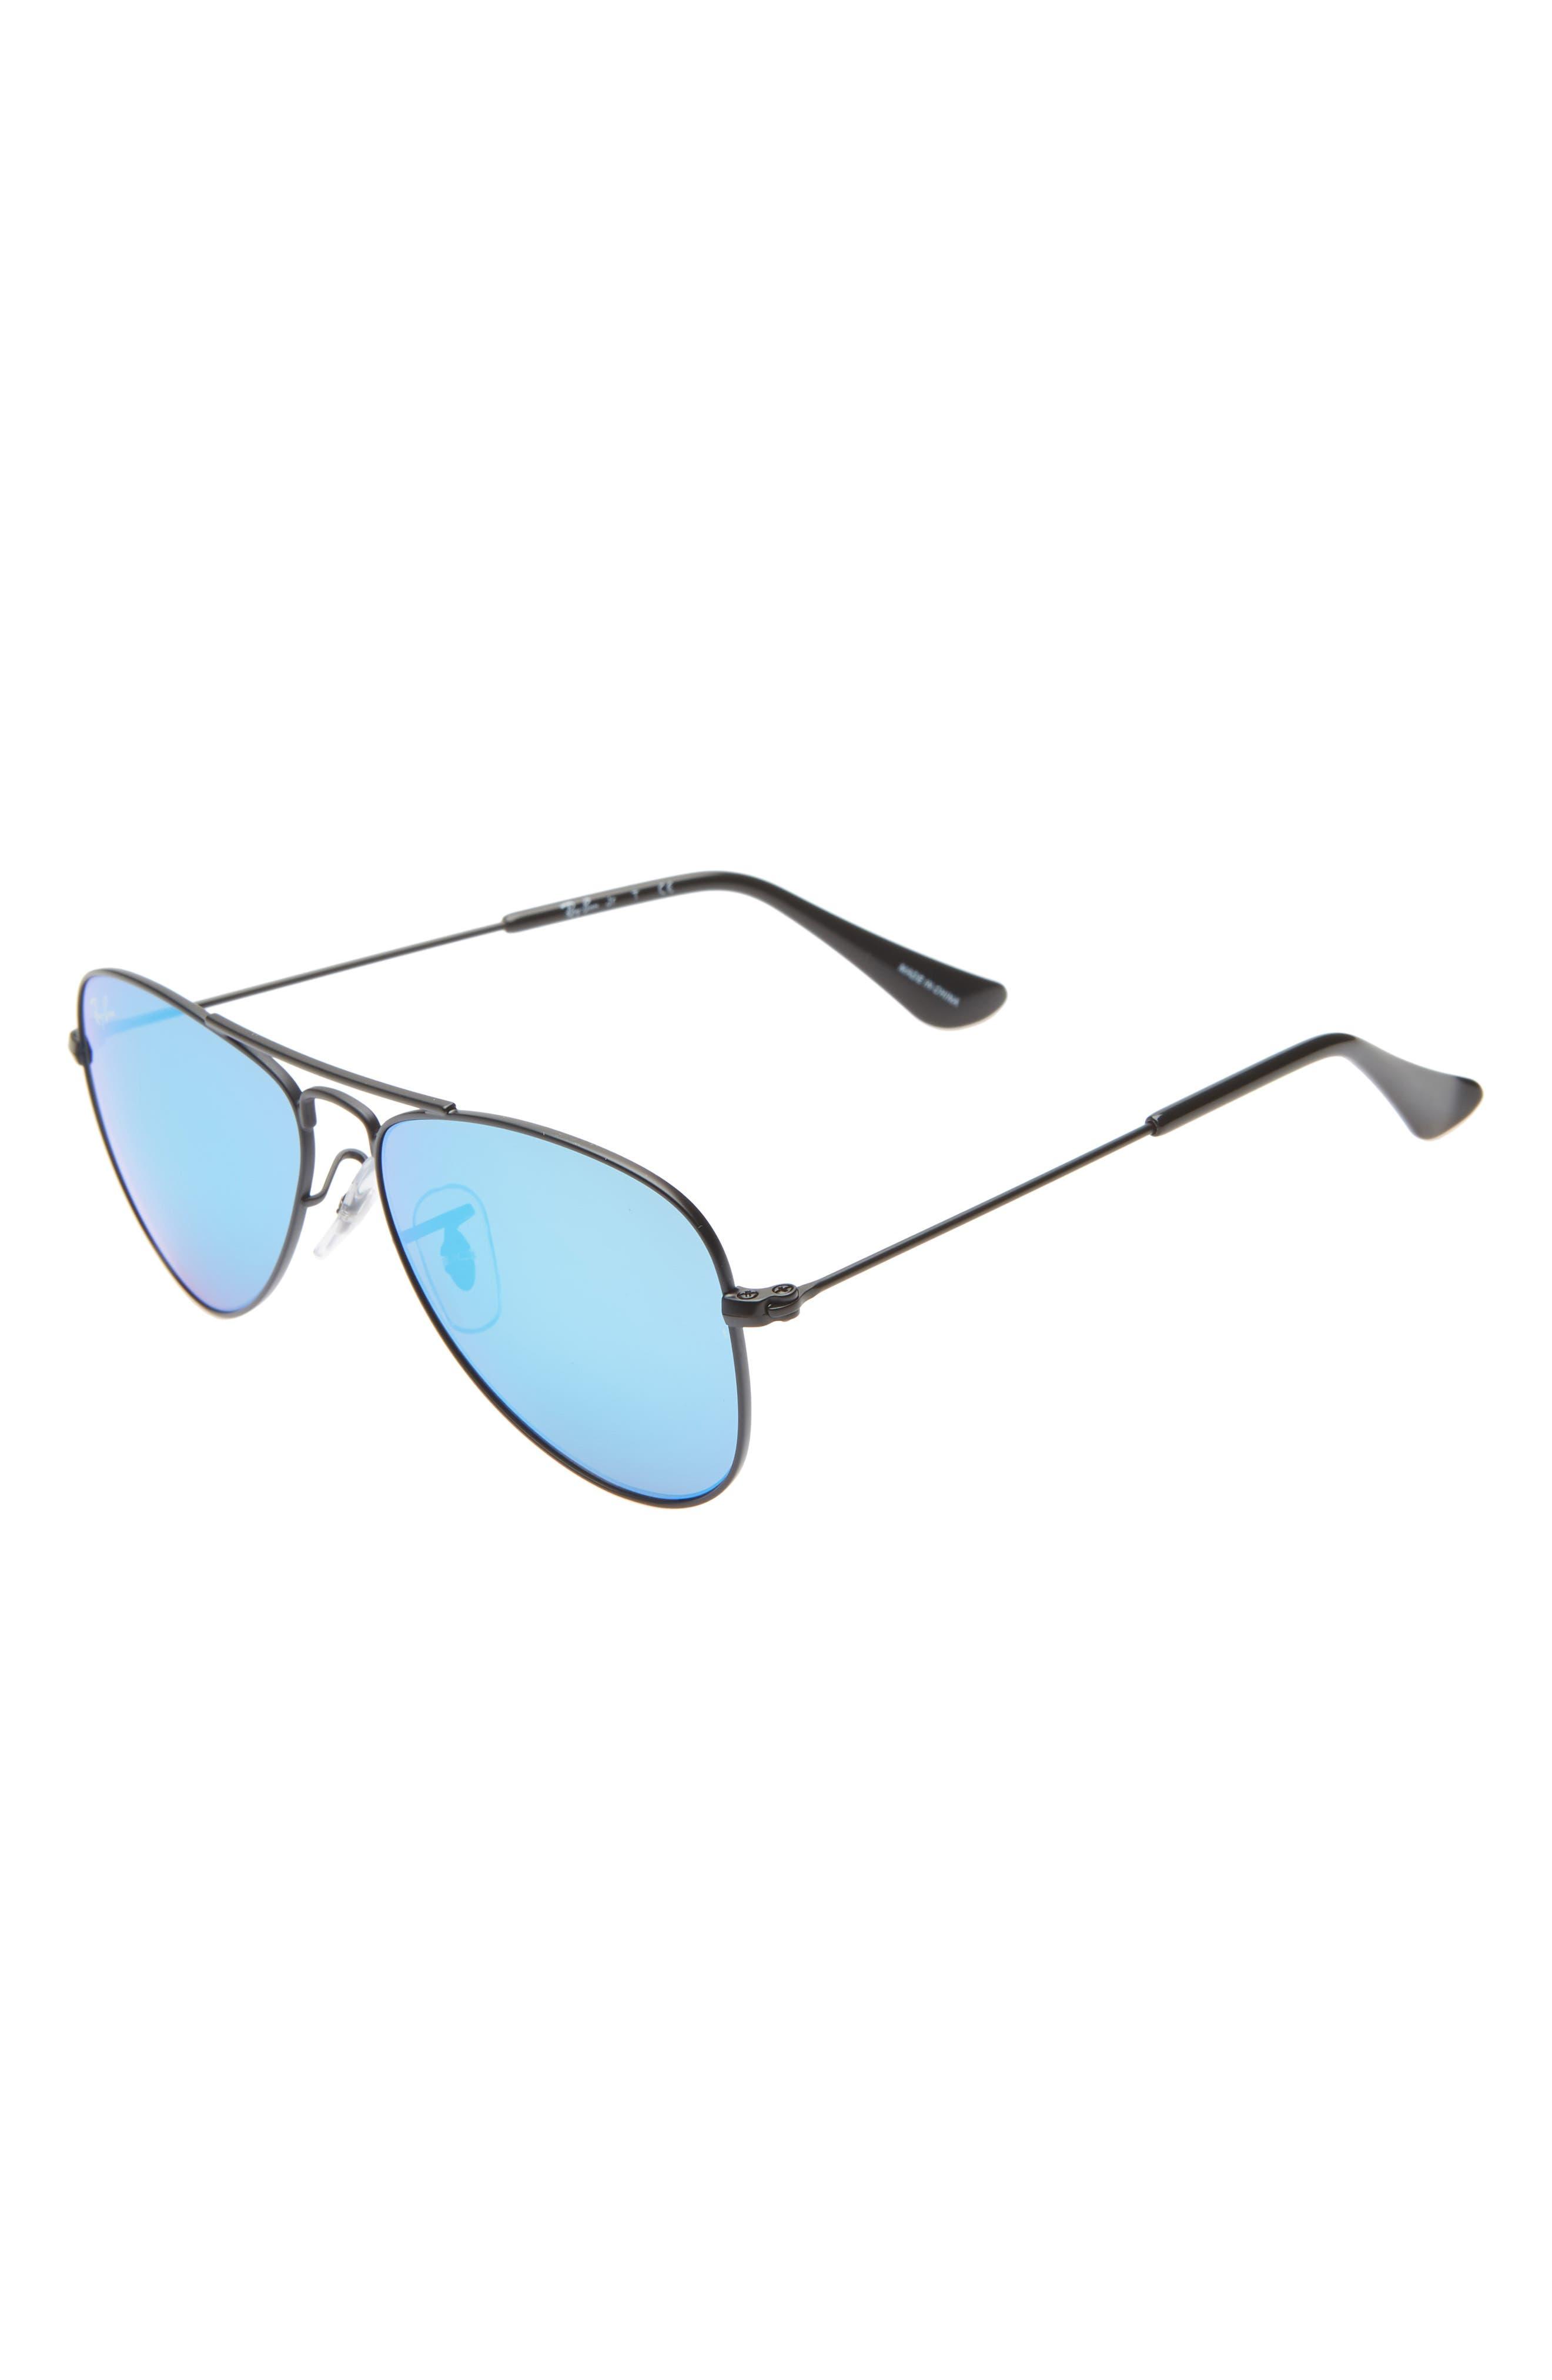 Junior 50mm Mirrored Aviator Sunglasses, Main, color, 001